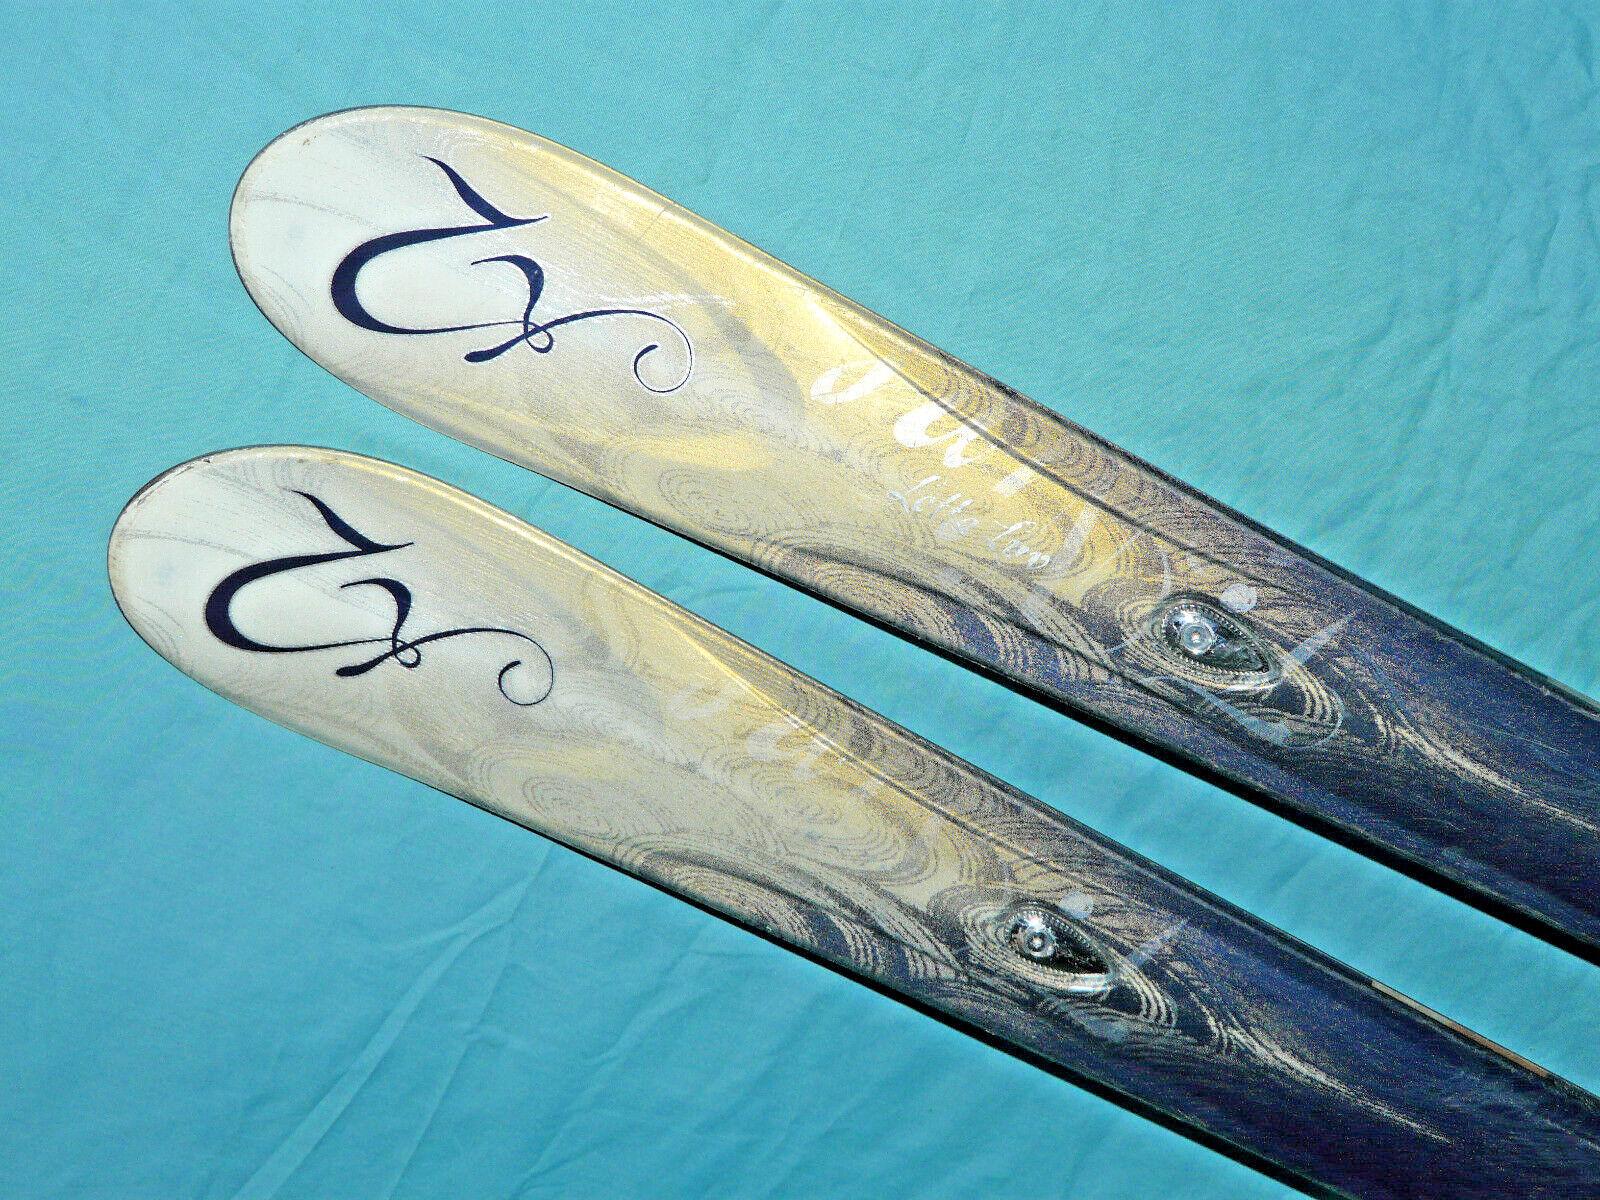 K2 Lotta LUV T Nine Women's Skis 160cm Flat with no bindings ❅❅ THINK SNOW  ❅❅